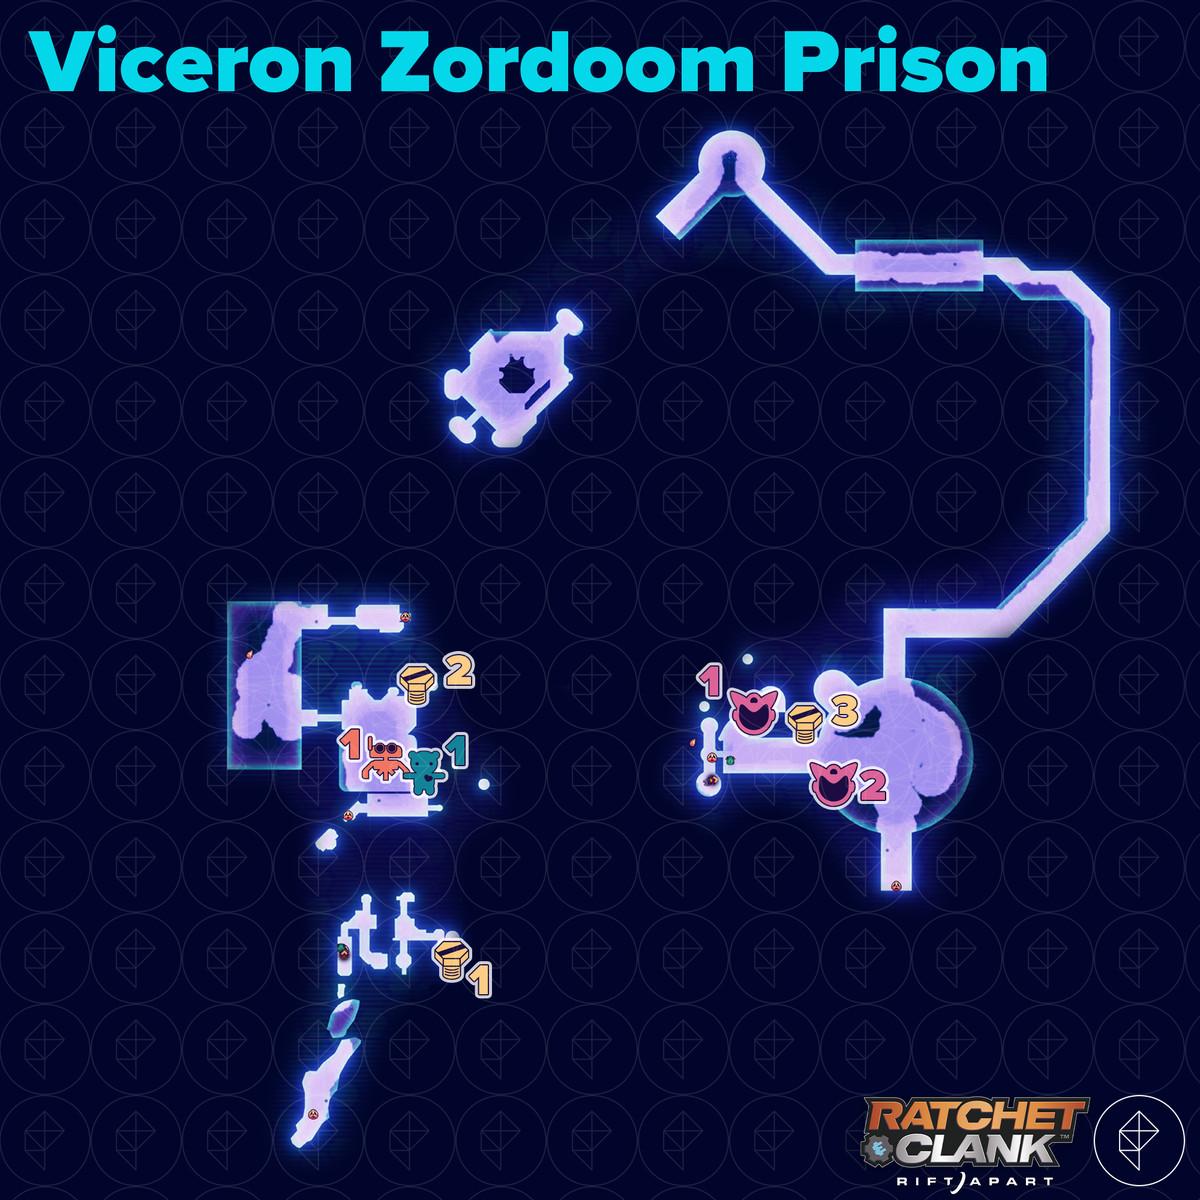 Ratchet & Clank: Rift Apart collectibles guide: Viceron Zordoom Prison